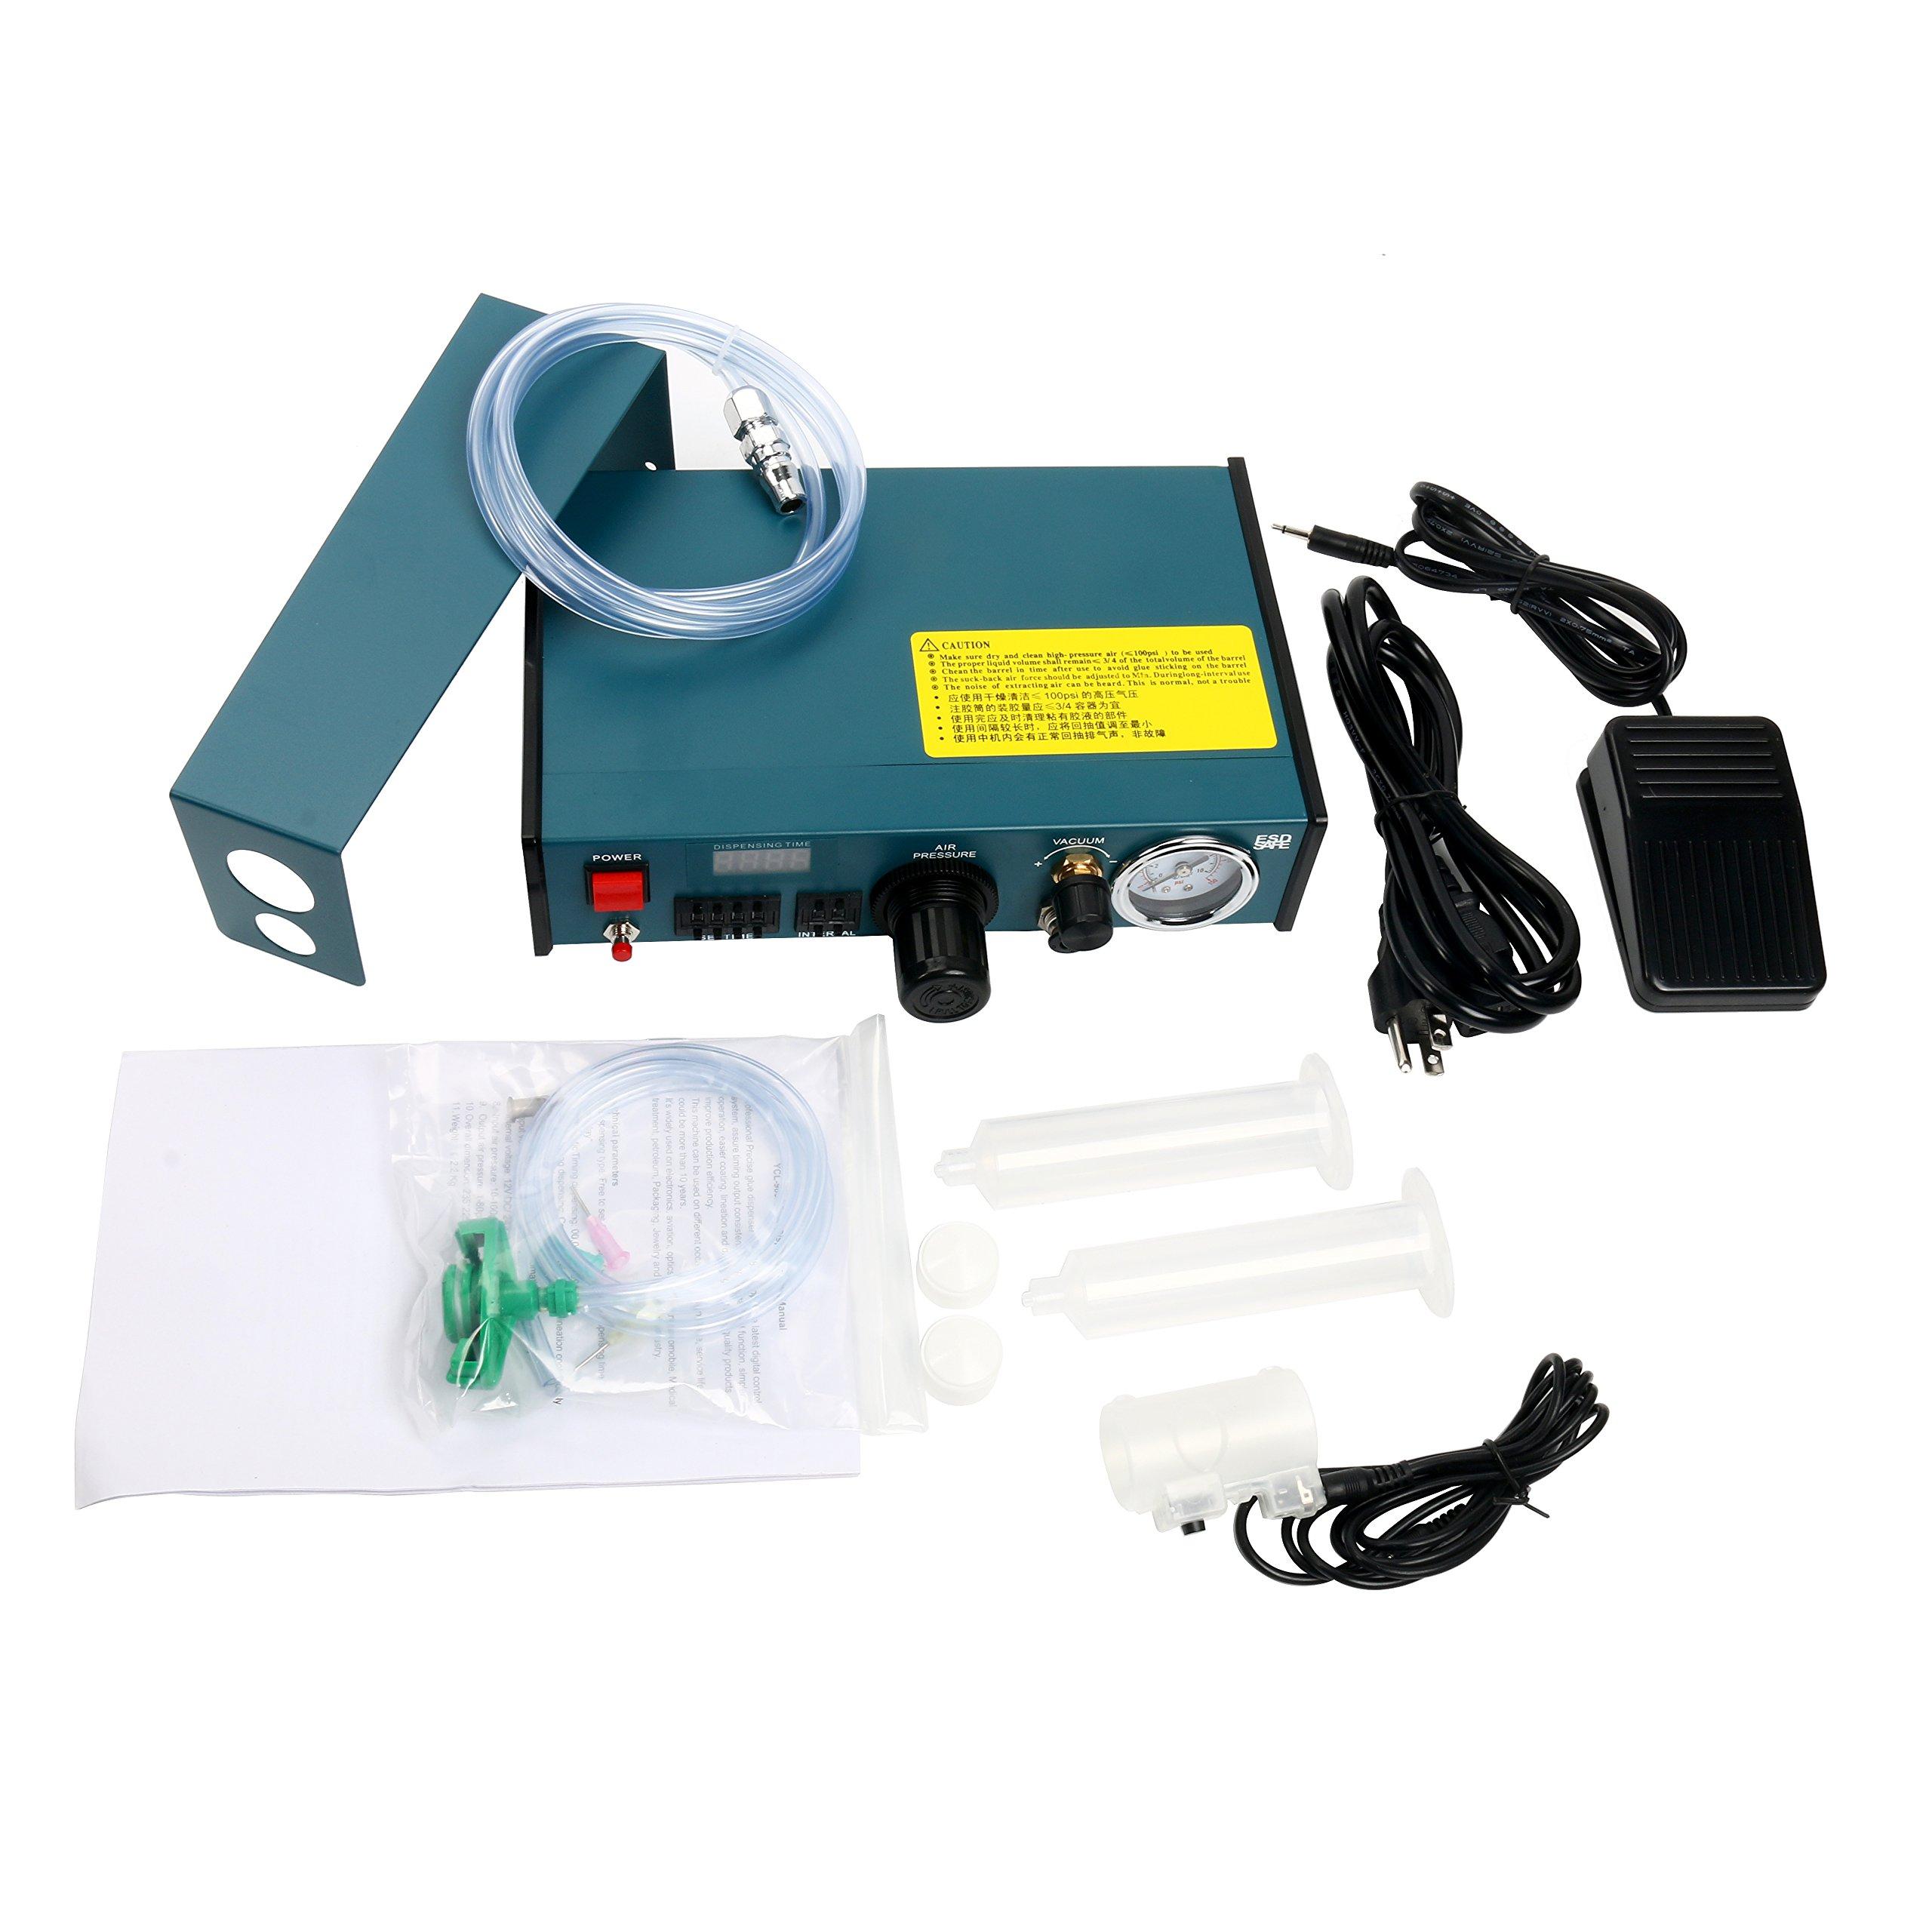 Digital Display Auto Glue Dispenser Solder Paste Liquid Controller Dropper 983A by YaeCCC (Image #2)